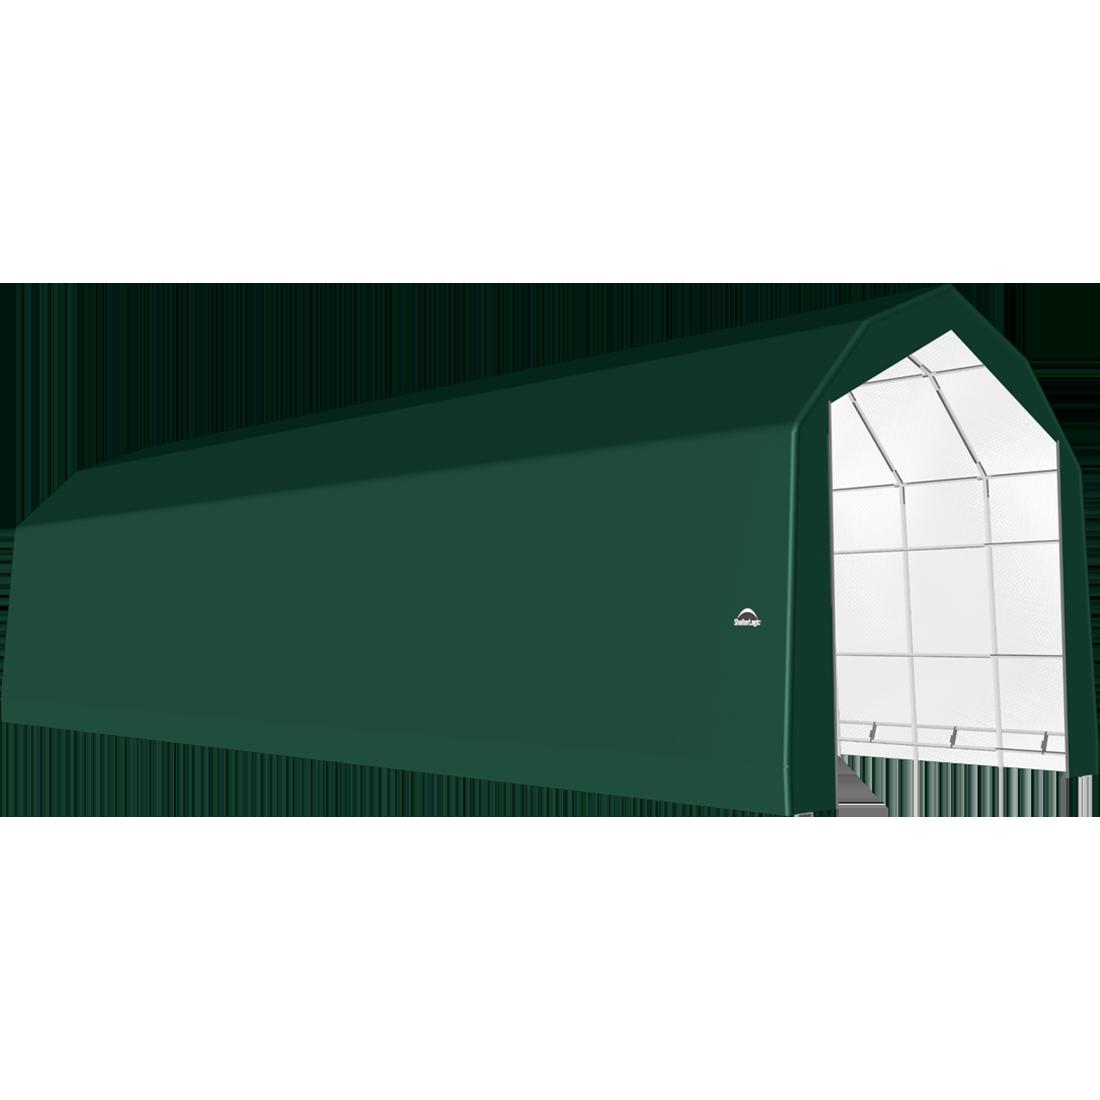 SP Barn 20X64X18 Green 14 oz PE Shelter